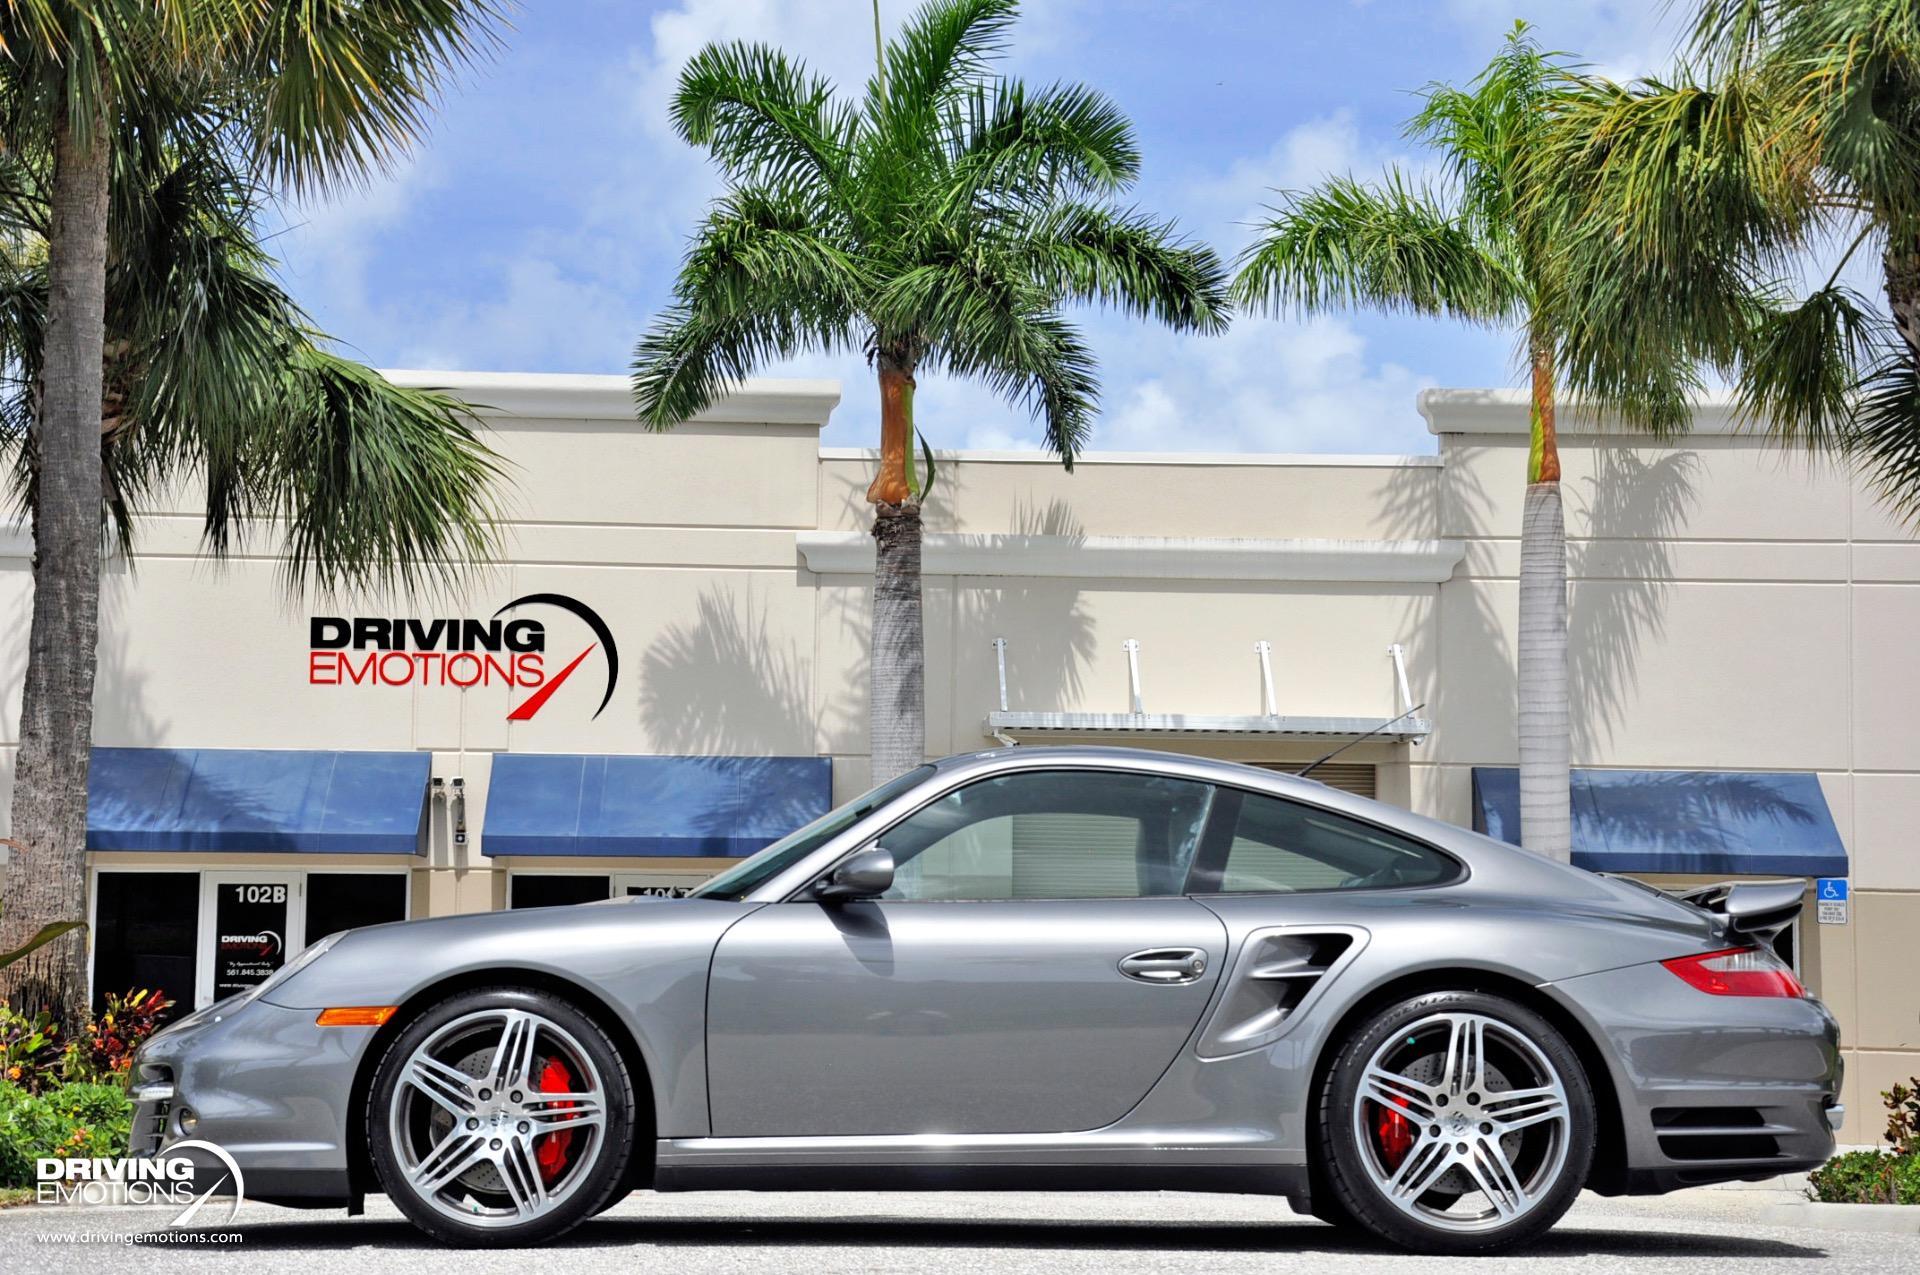 Used 2007 Porsche 911 Turbo Coupe Turbo $136k MSRP!! | Lake Park, FL